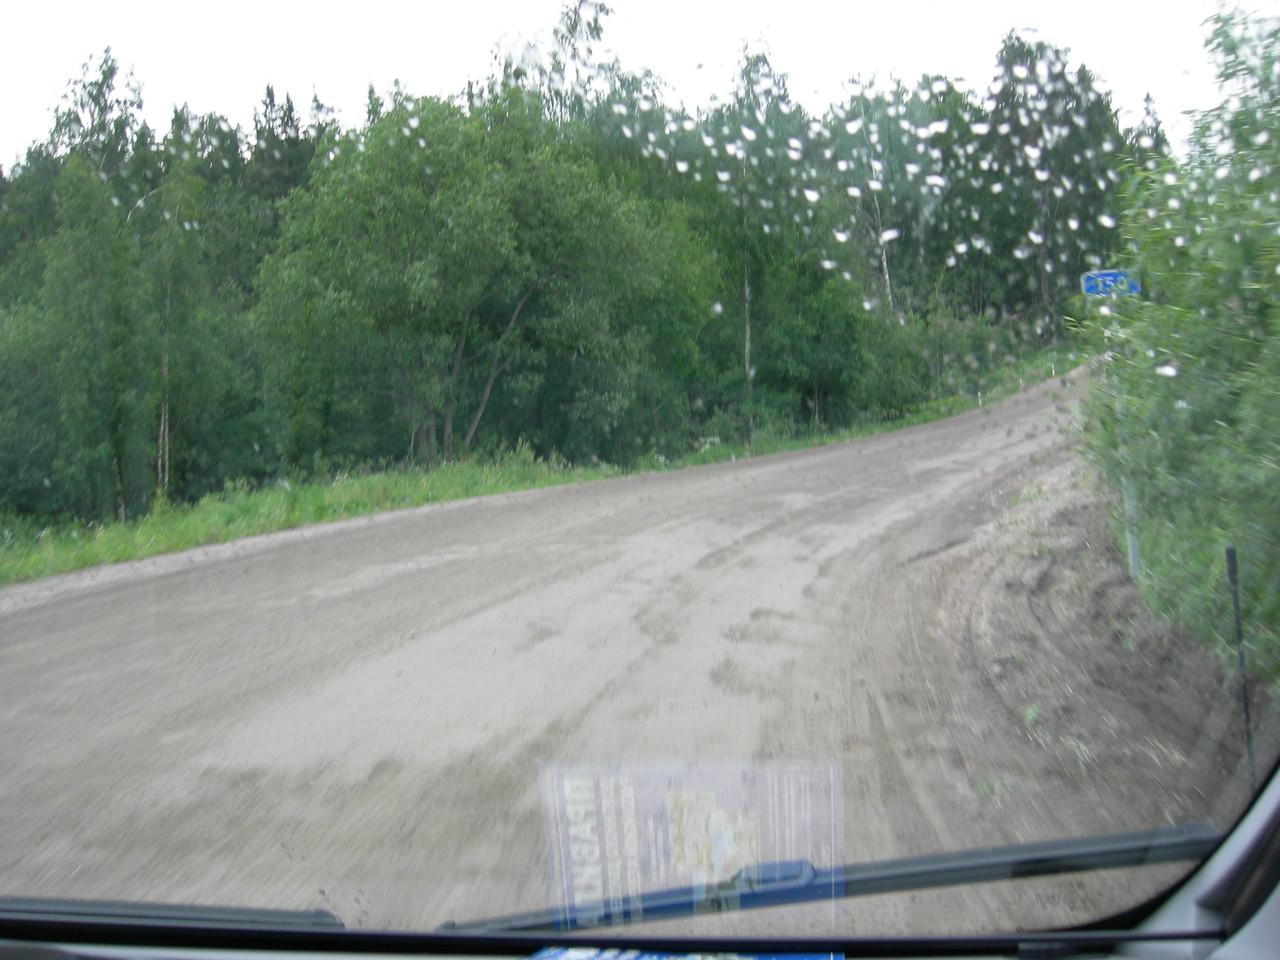 Naturstrassen in Karelien